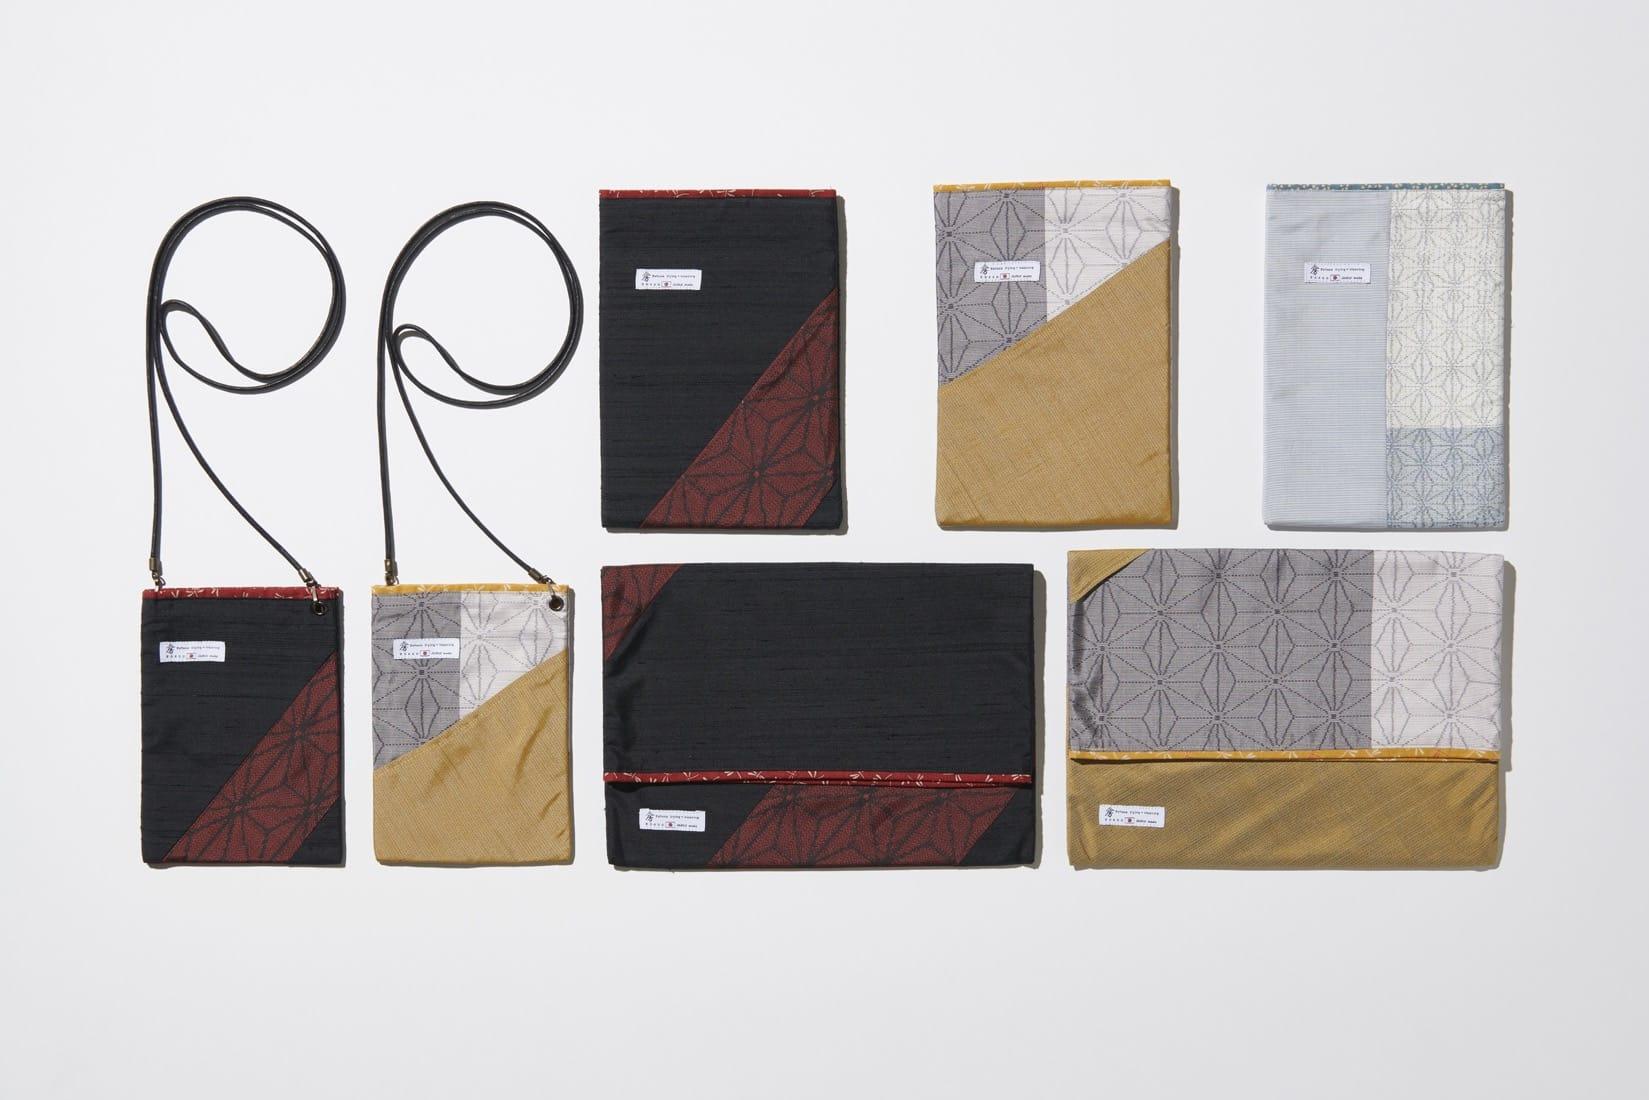 Tablet case,Porch,Clutch bag 物撮り